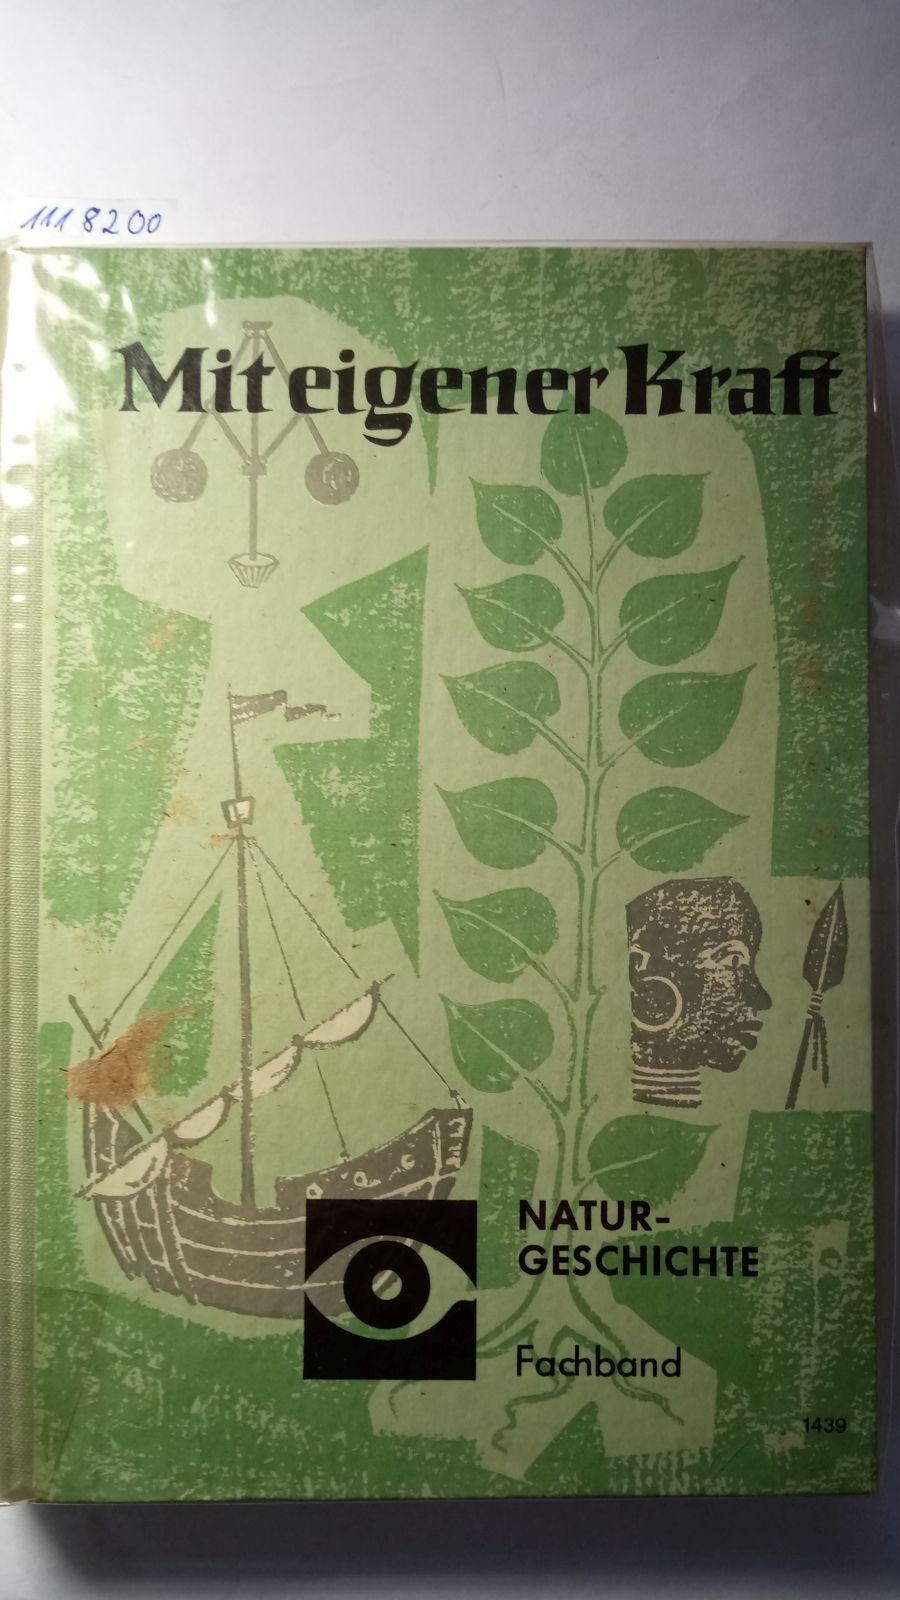 Mit eigener Kraft. Fachband 1439 - Naturgeschichte: Bearbeitung: Weise, Kurt